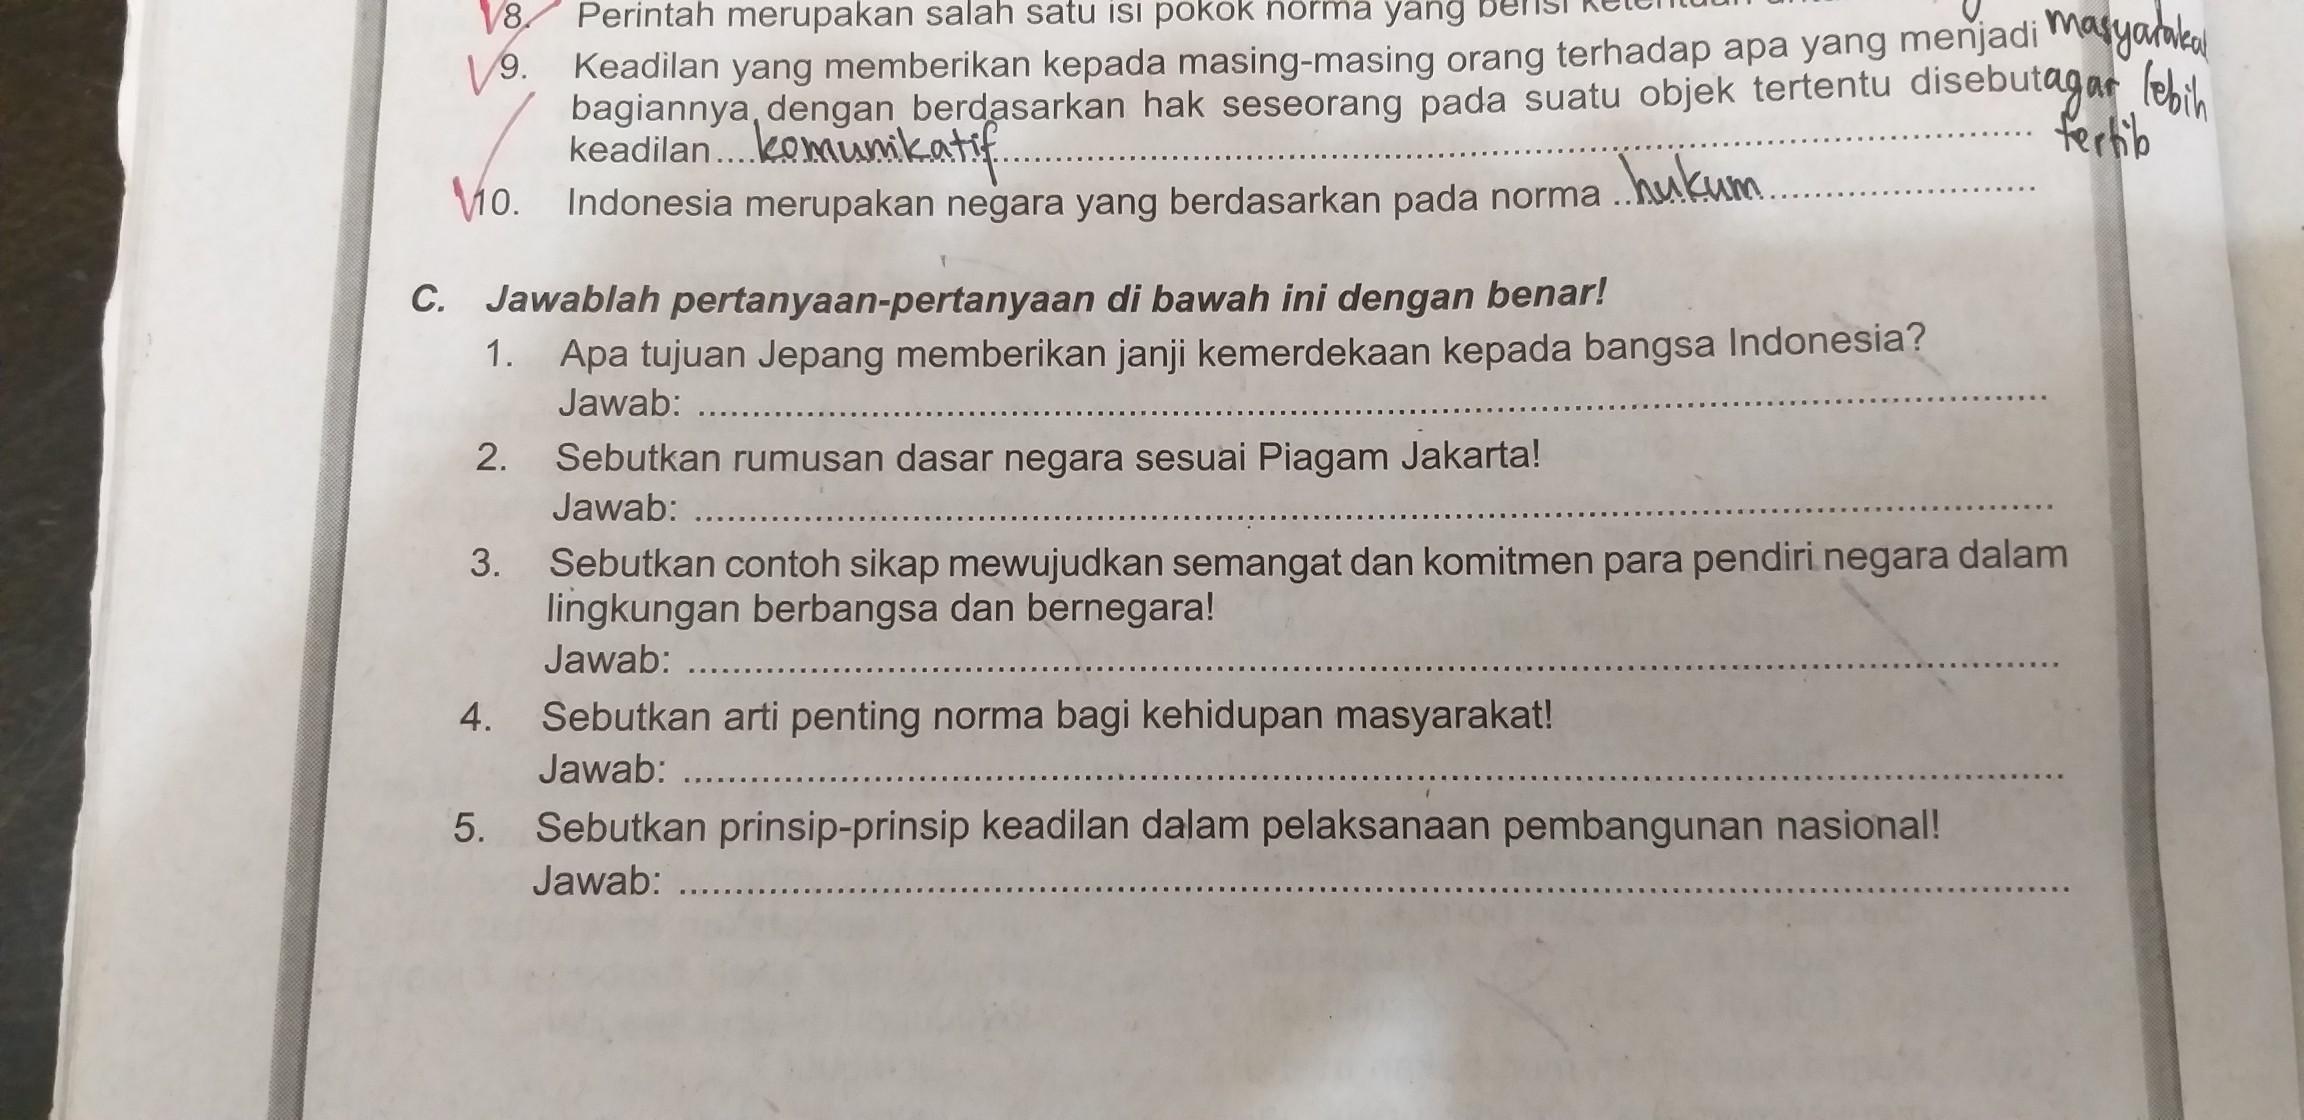 Sebutkan Rumusan Dasar Negara Sesuai Piagam Jakarta - Coba ...